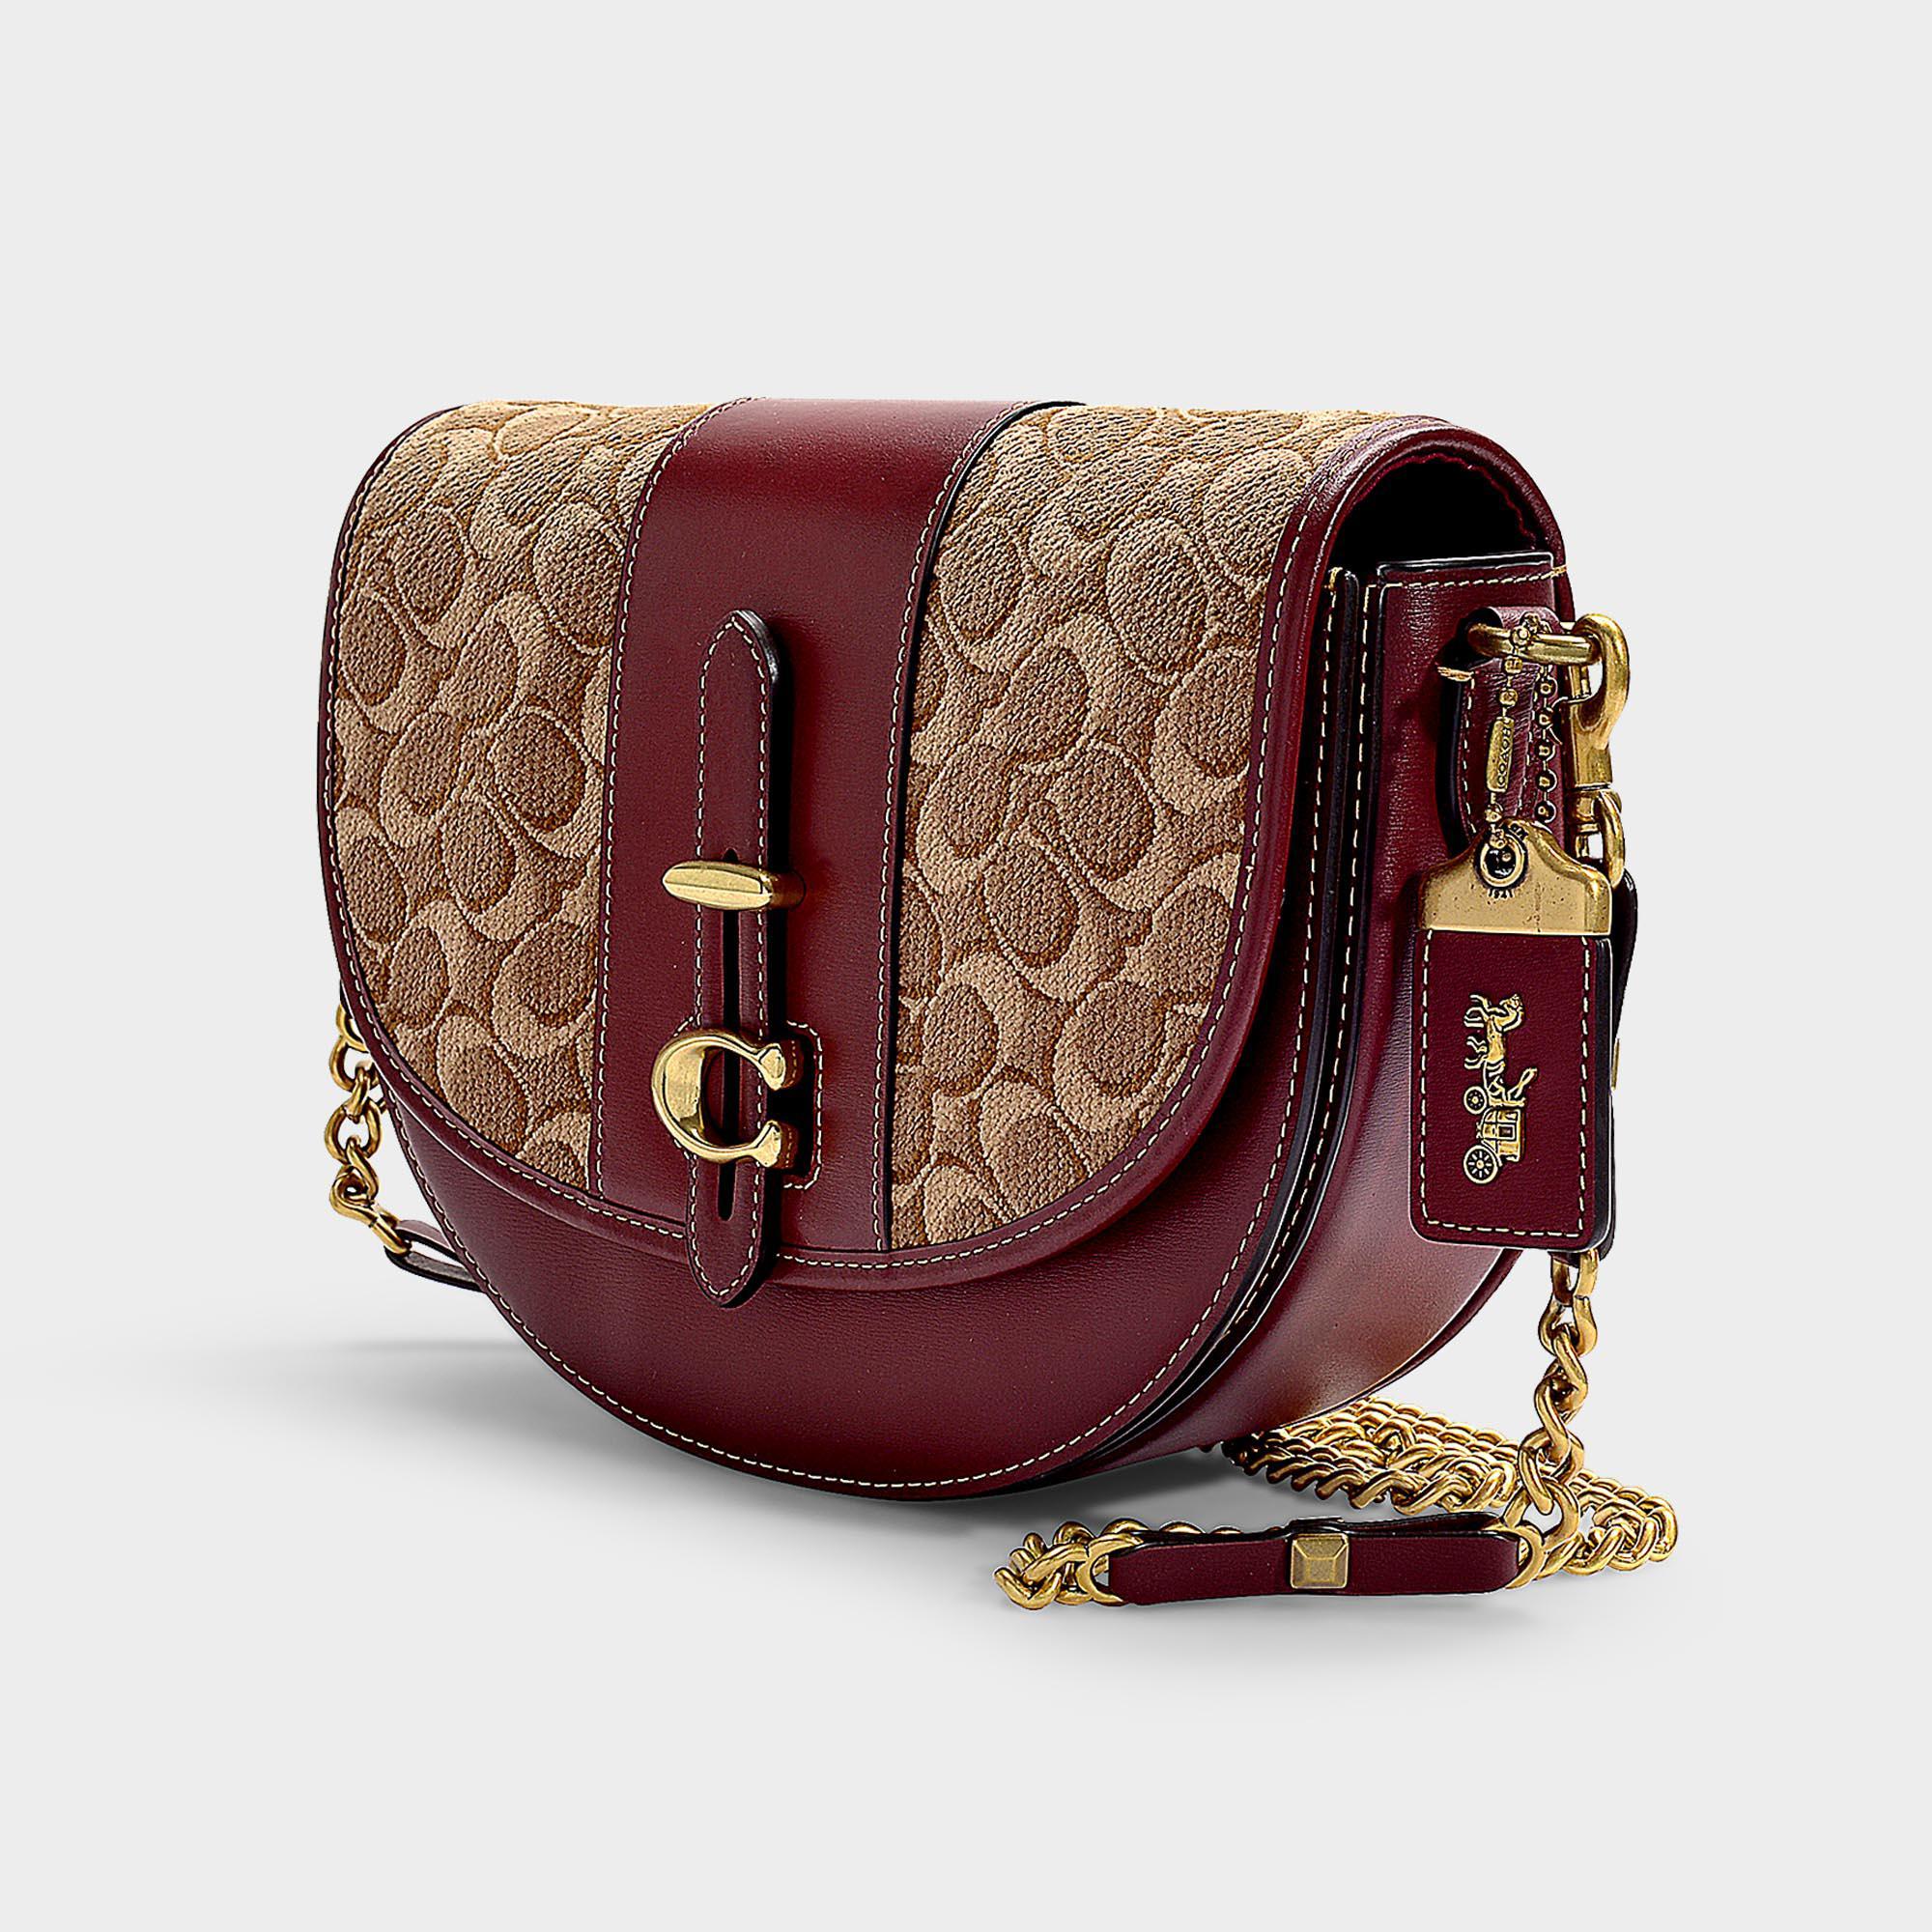 ... best price coach natural saddle bag 24 in tan scarlet signature jacquard  lyst. view fullscreen 305a1832e04fd